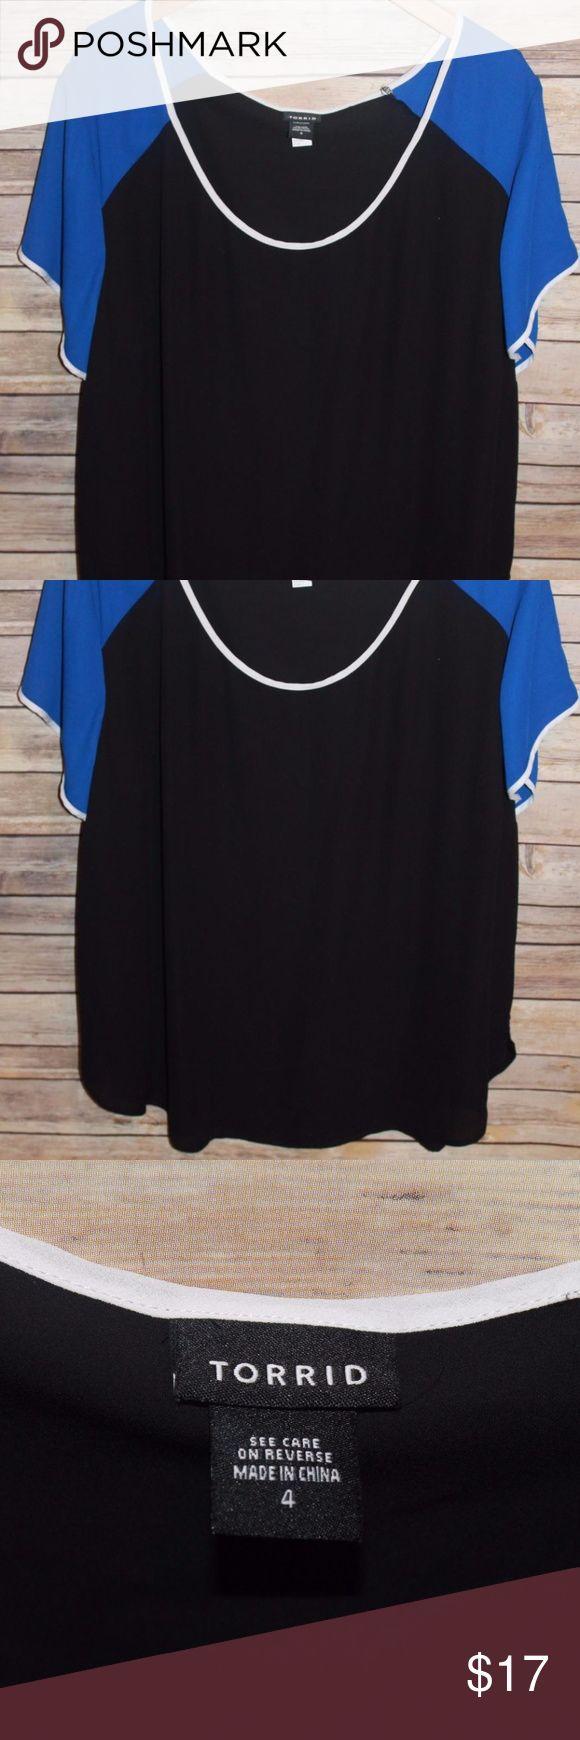 Torrid Chiffon Semi Sheer Blouse Blue 4 HW729 Torrid   Plus Size 4 Semi Sheer Chiffon Blouse  Color: Black with Blue and White  Short Sleeve     100% Polyester torrid Tops Blouses